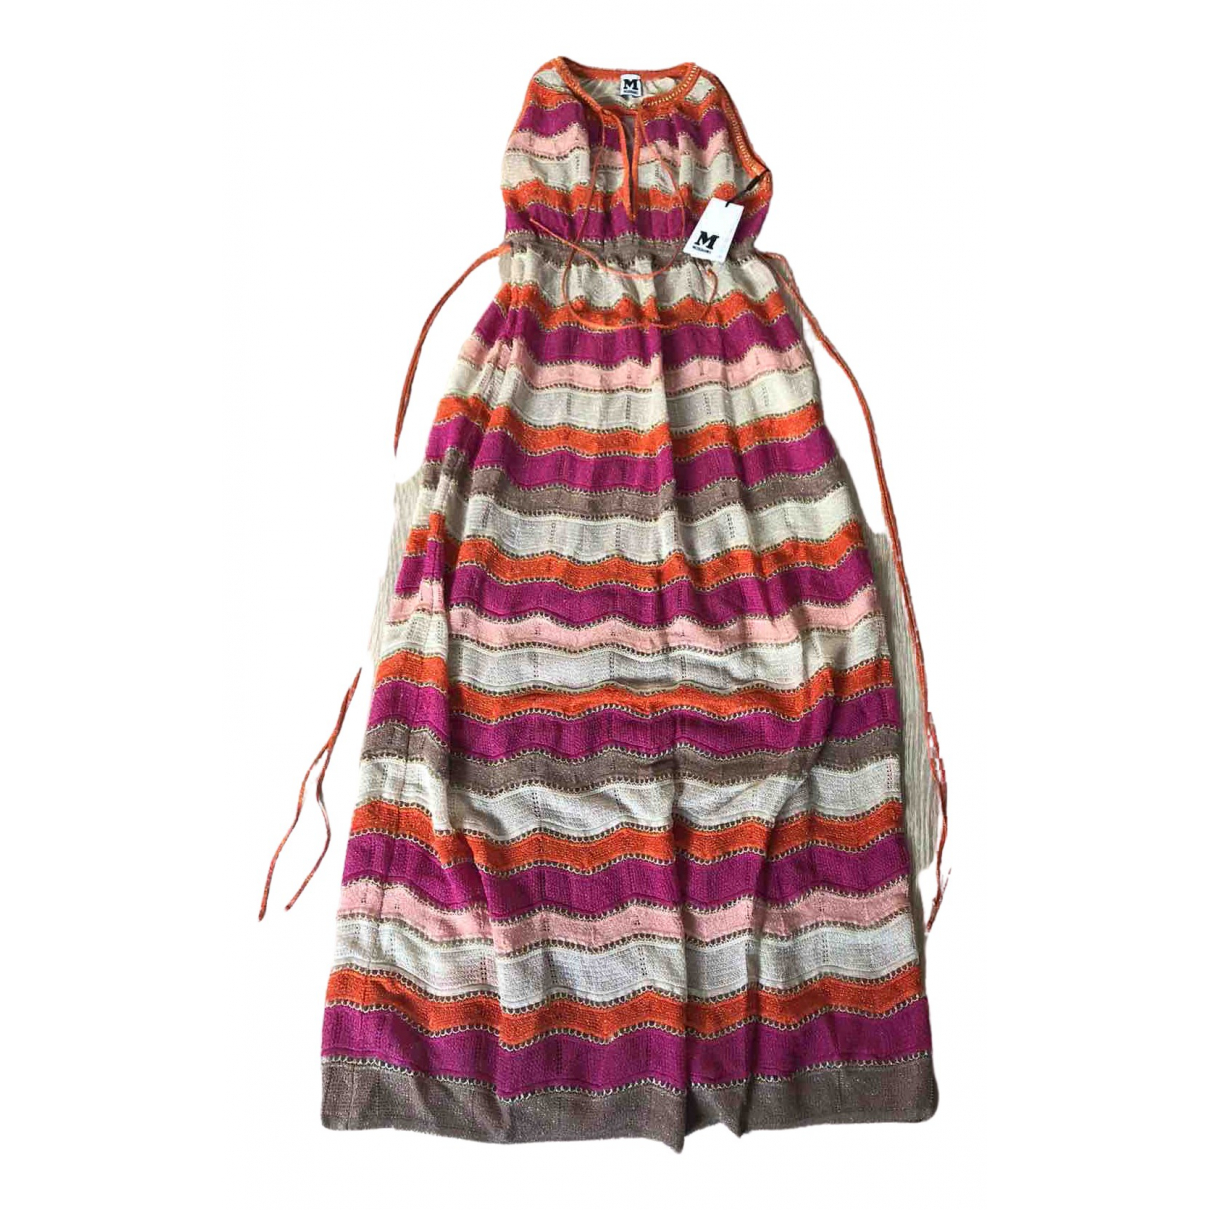 M Missoni \N Multicolour dress for Women 44 IT